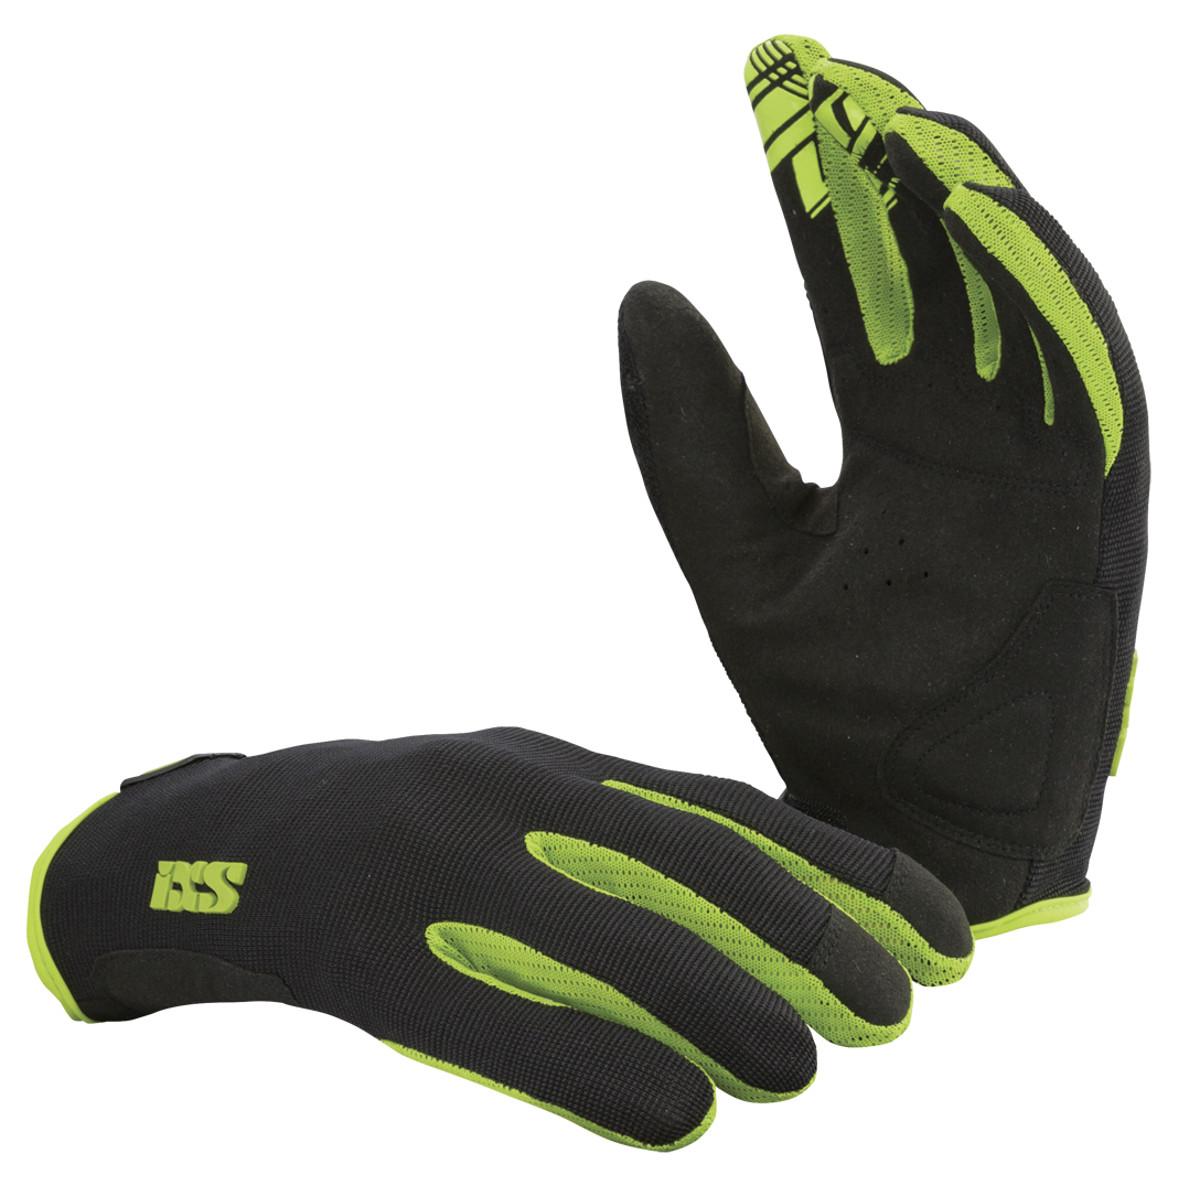 IXS Downhill-Handschuhe TR-X1.1, XL, Schwarz